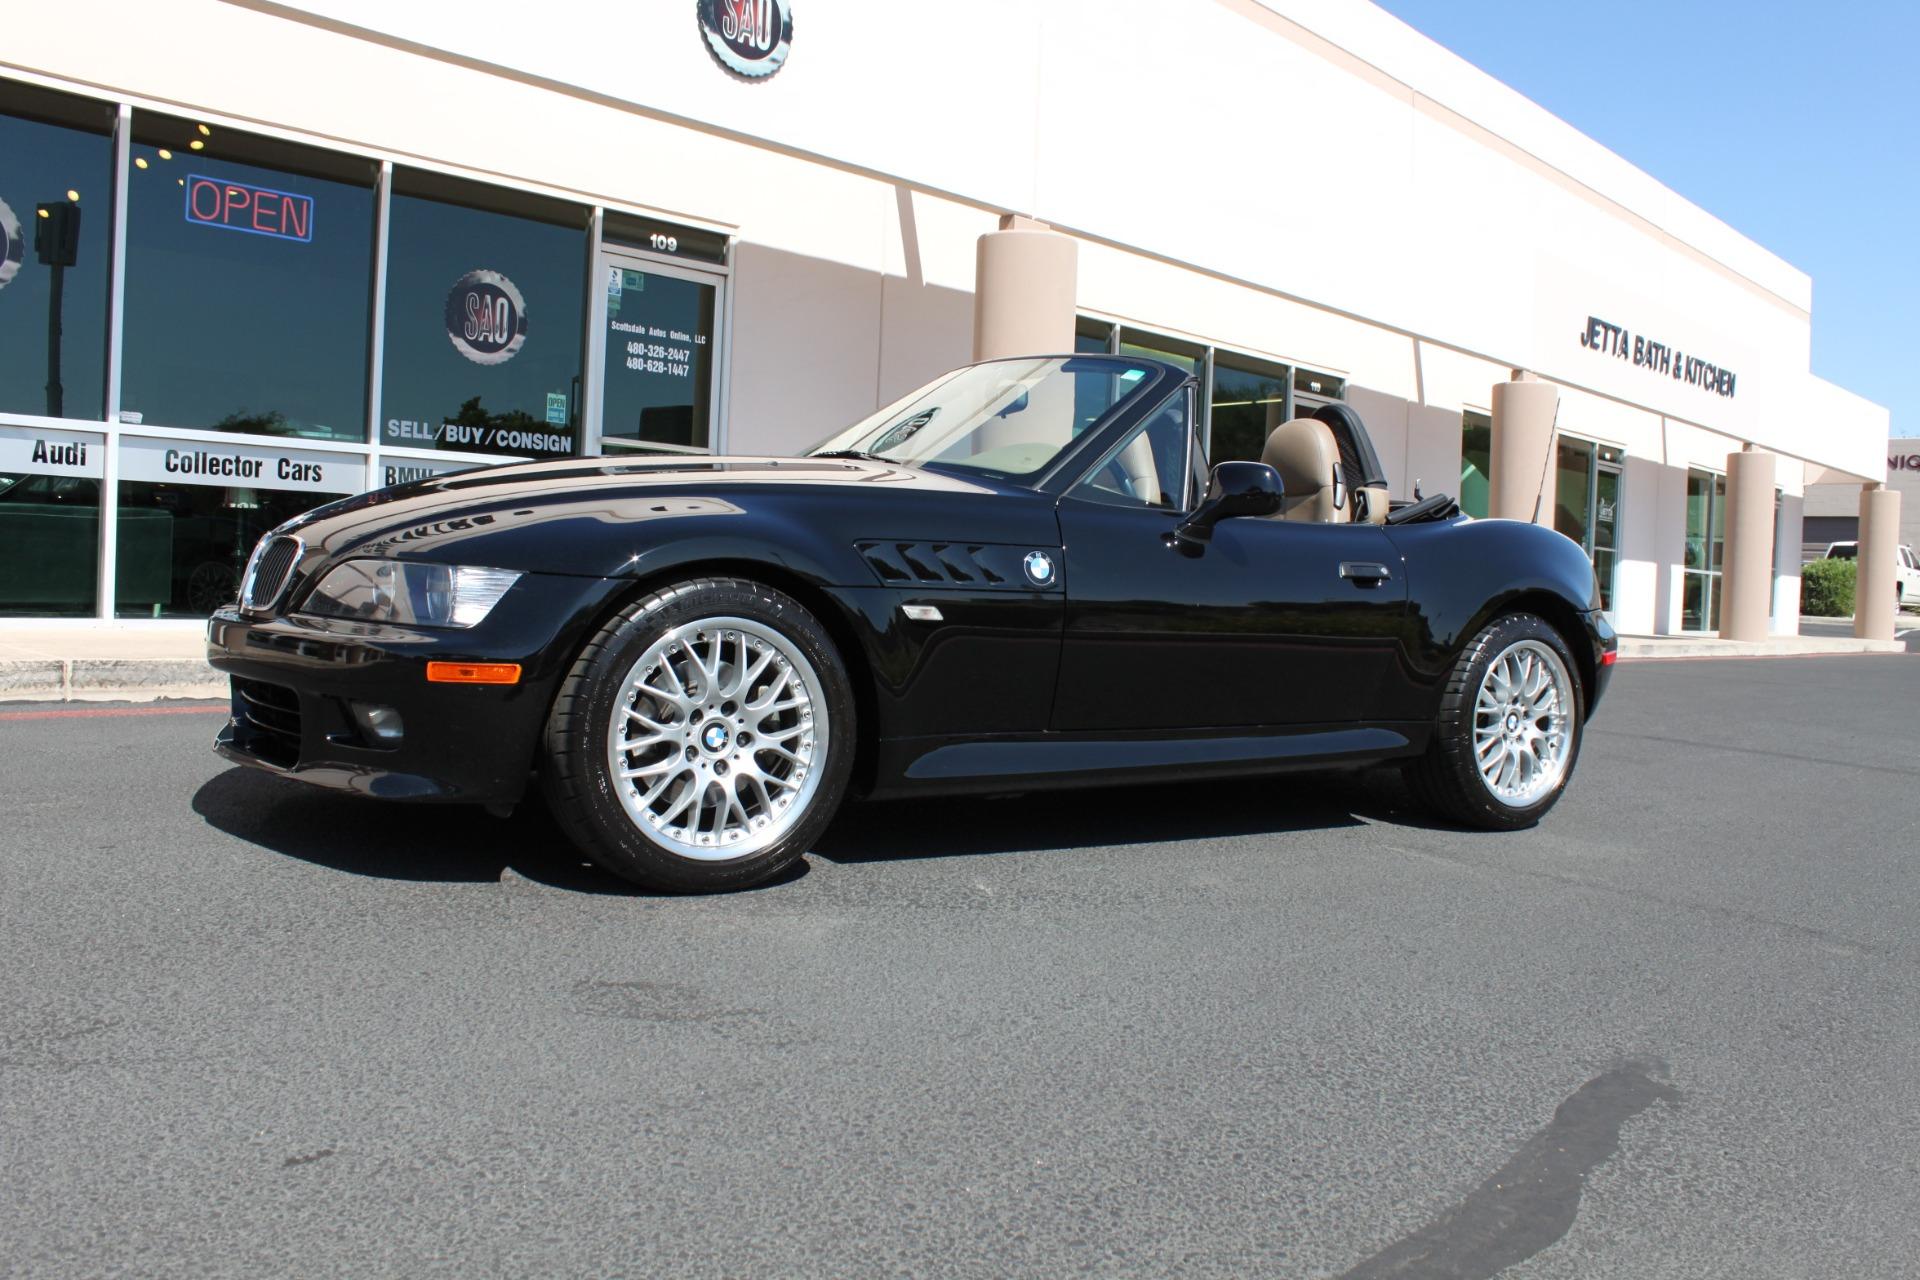 Used-2001-BMW-Z3-Roadster-30i-Audi-Service-Libertyville-IL